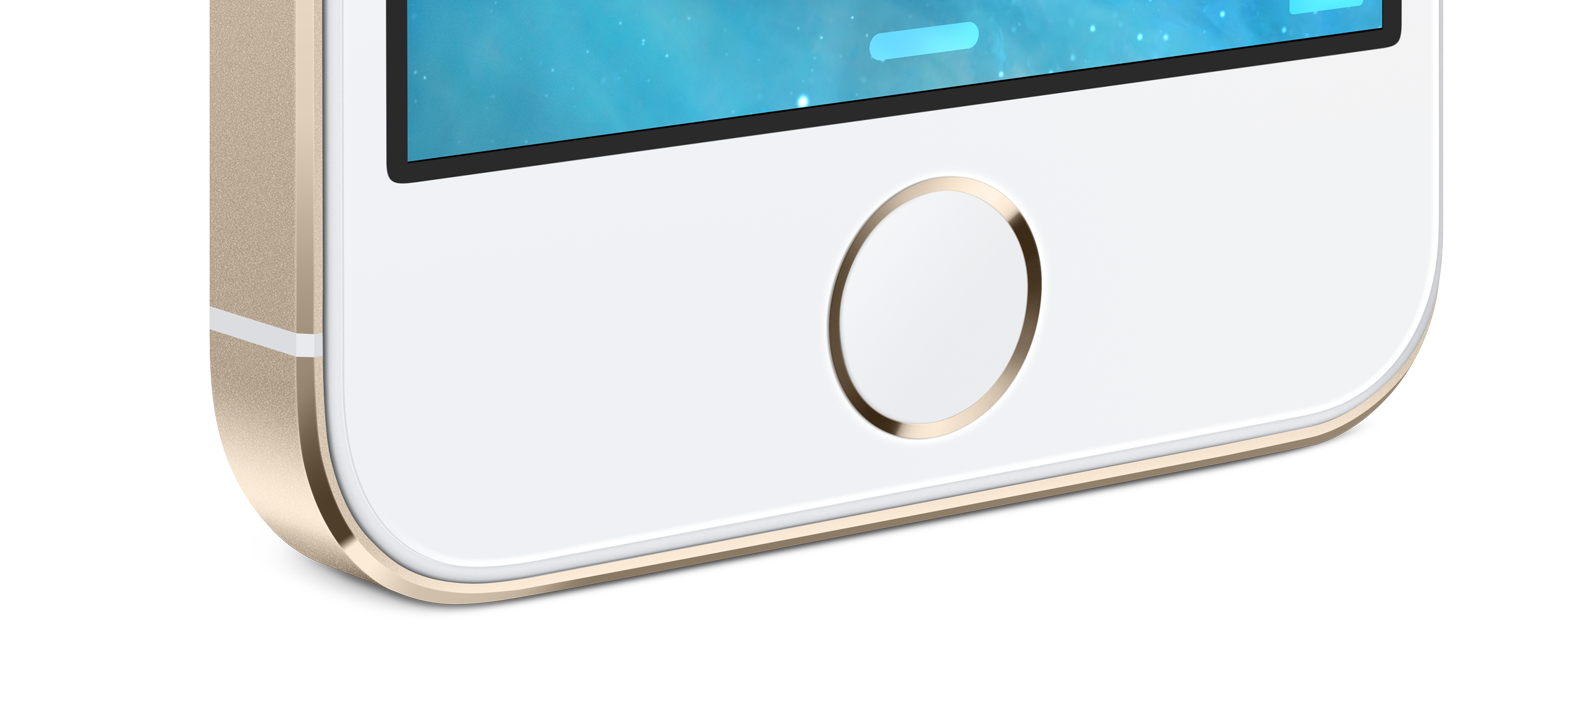 iphone5s(2)